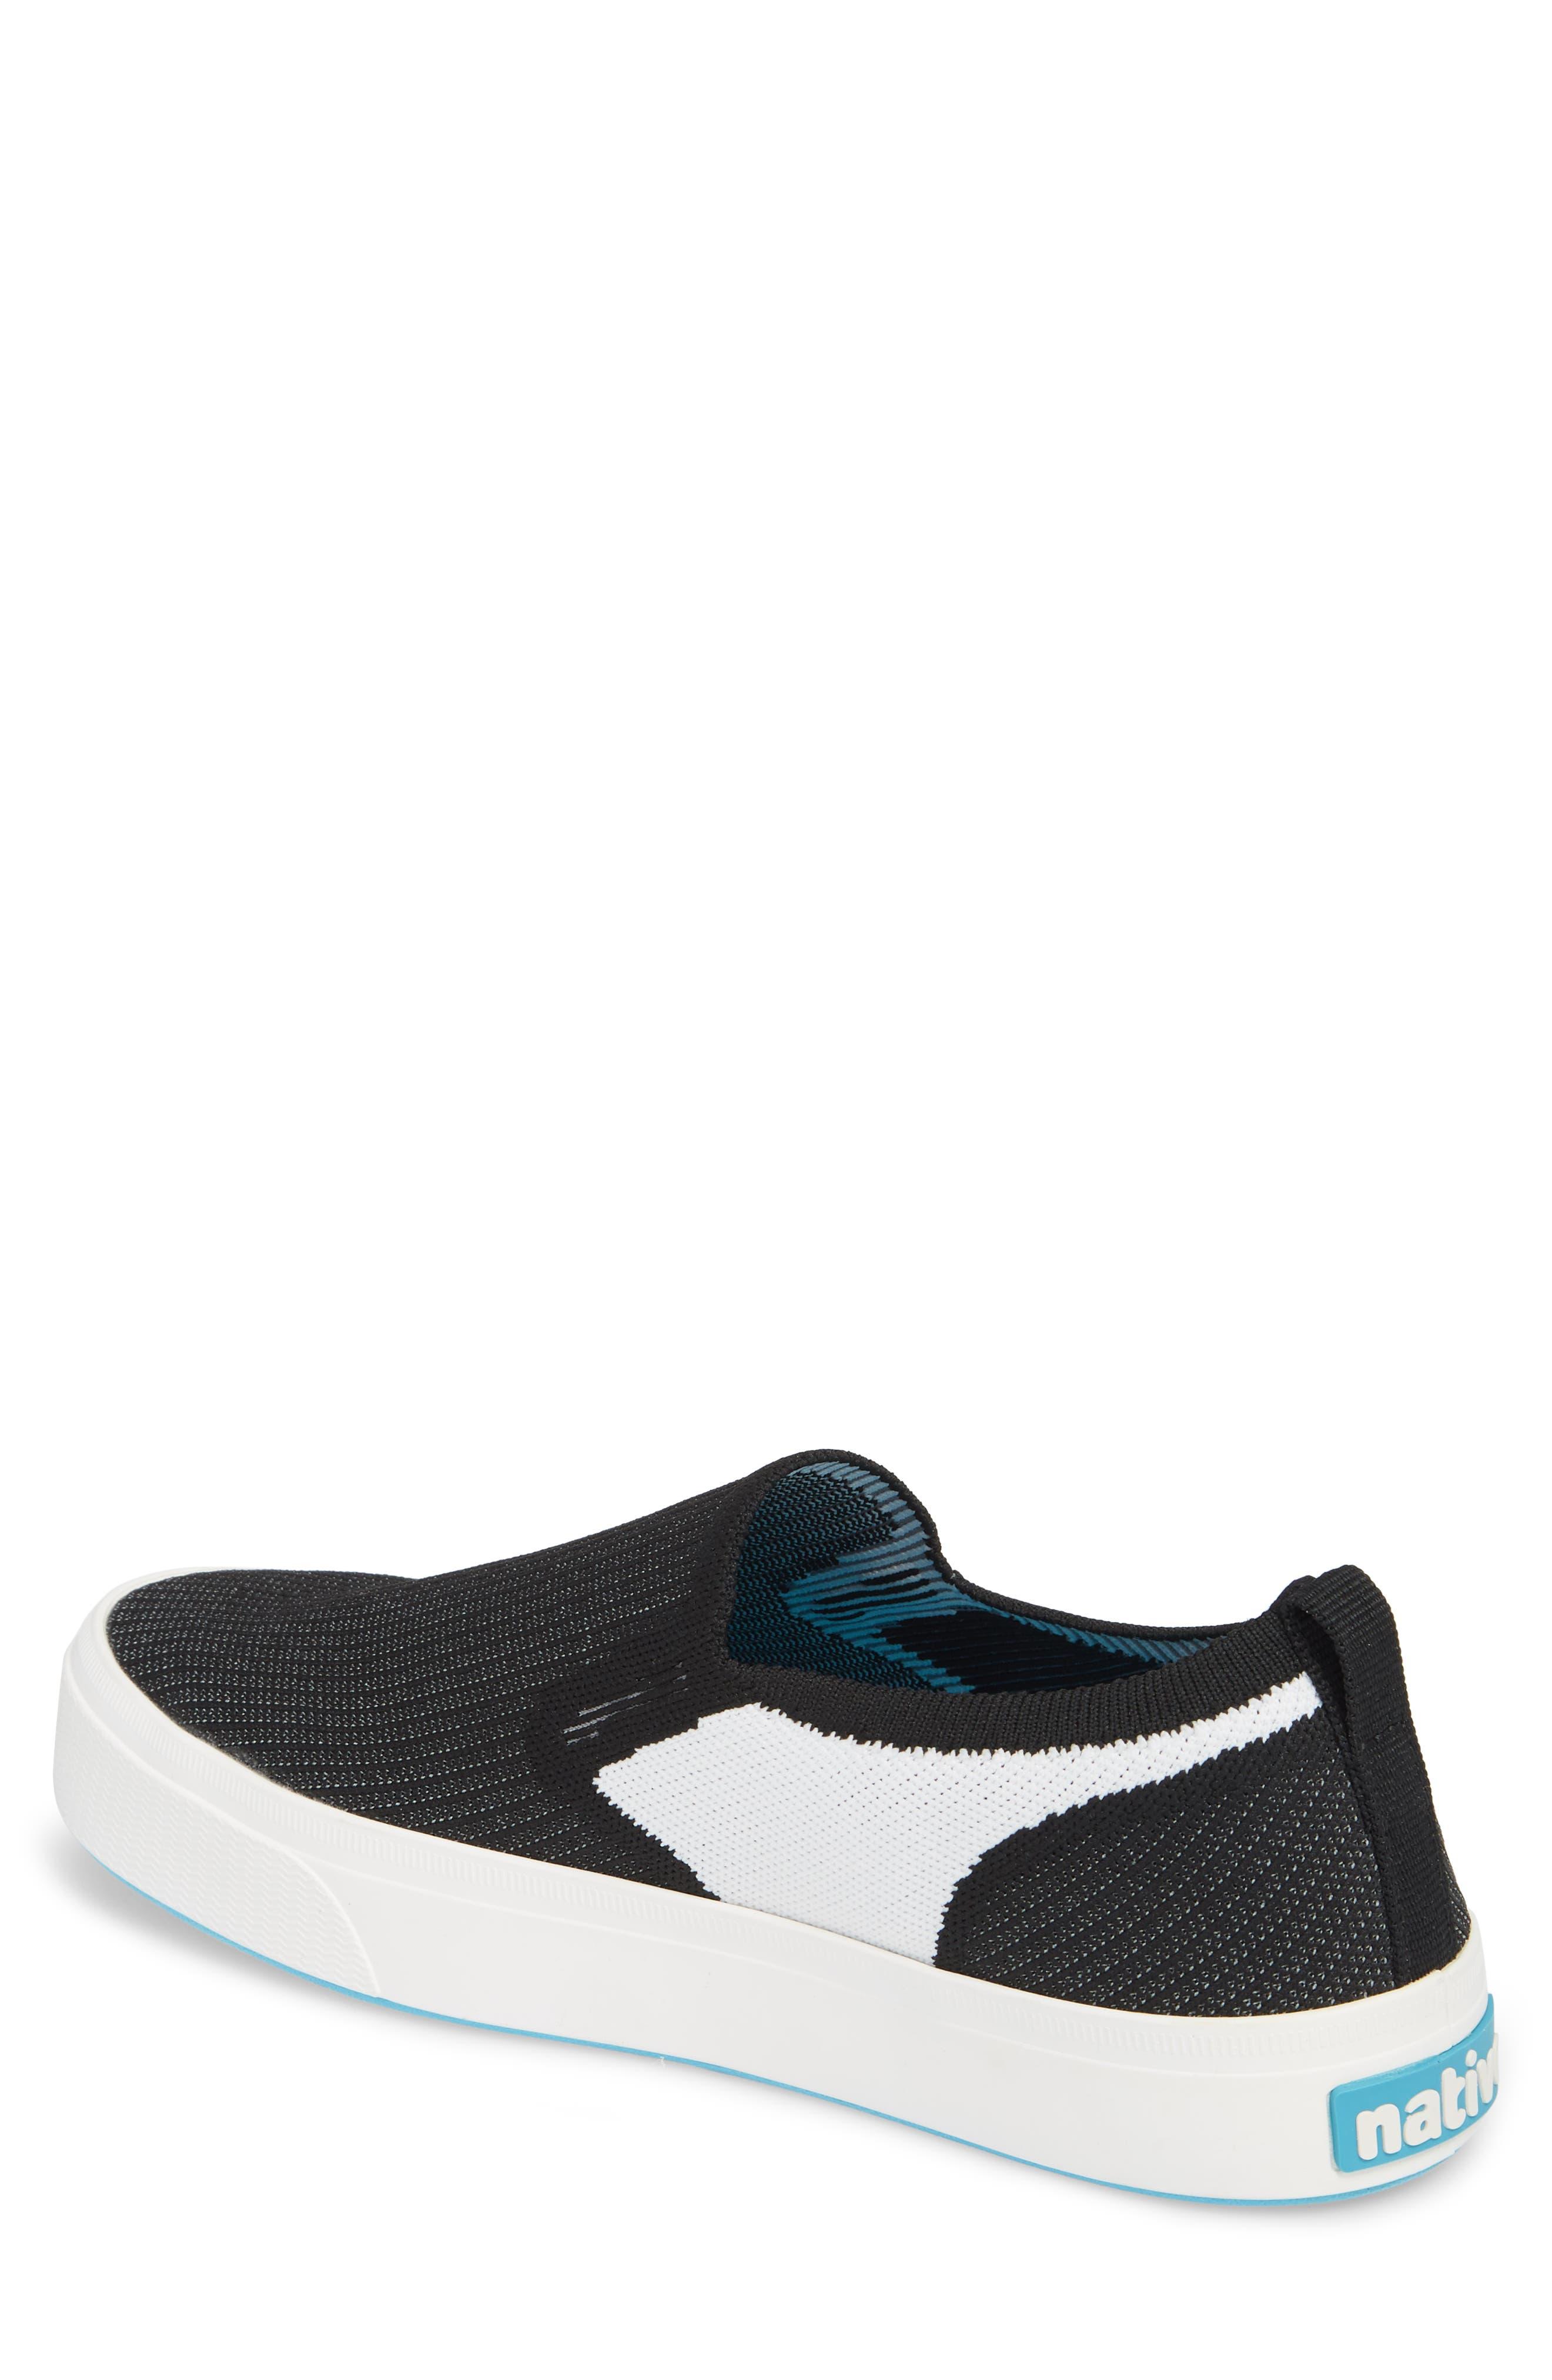 Native Miles LiteKnit Slip-On Sneaker,                             Alternate thumbnail 2, color,                             Jiffy Black/ Shell White